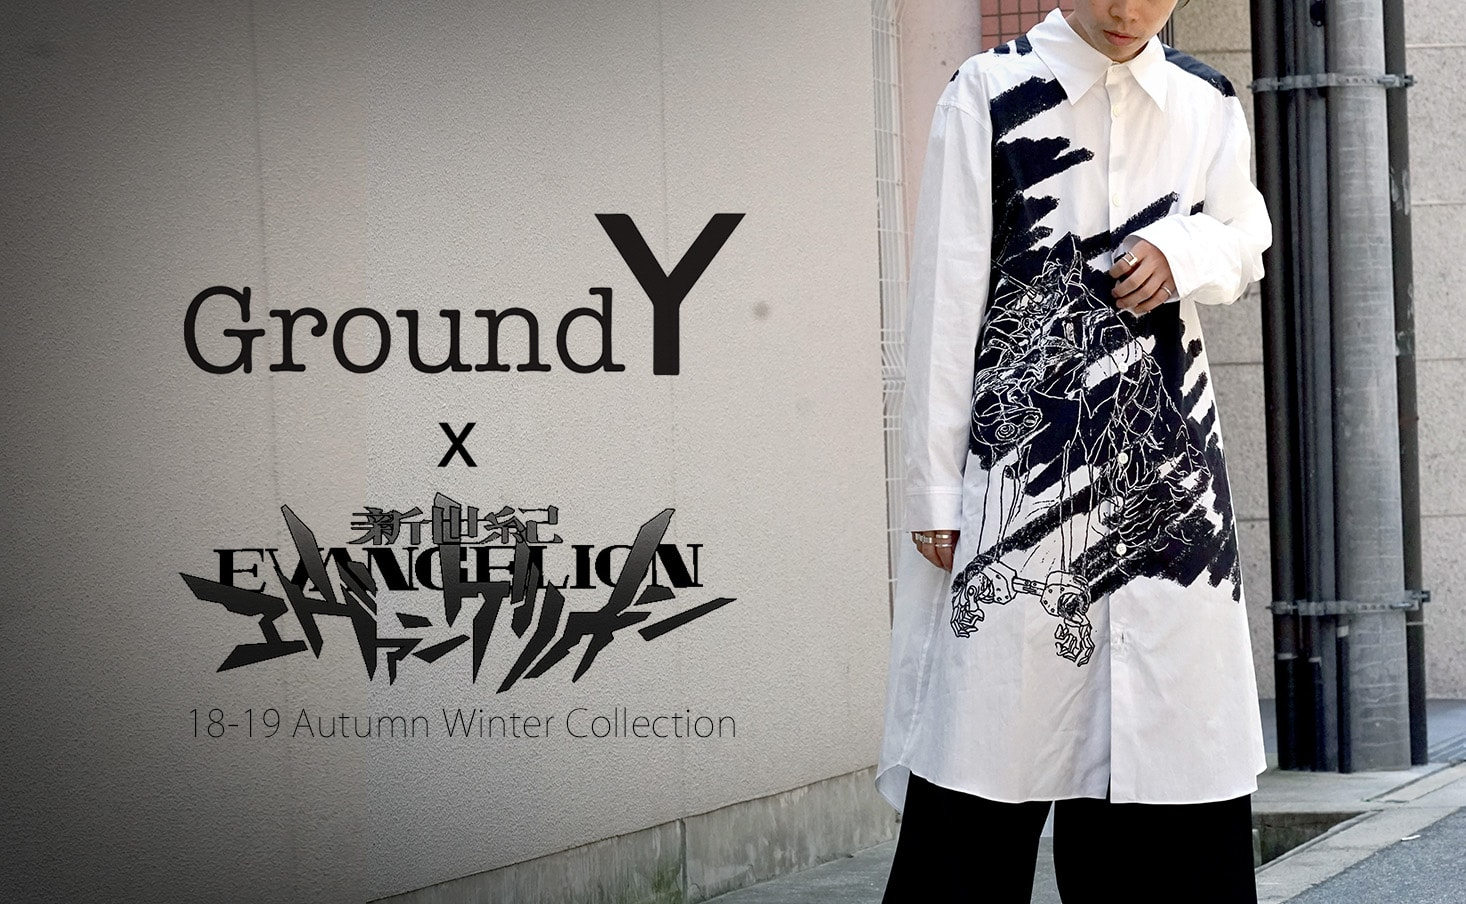 Ground Y x エヴァンゲリオン